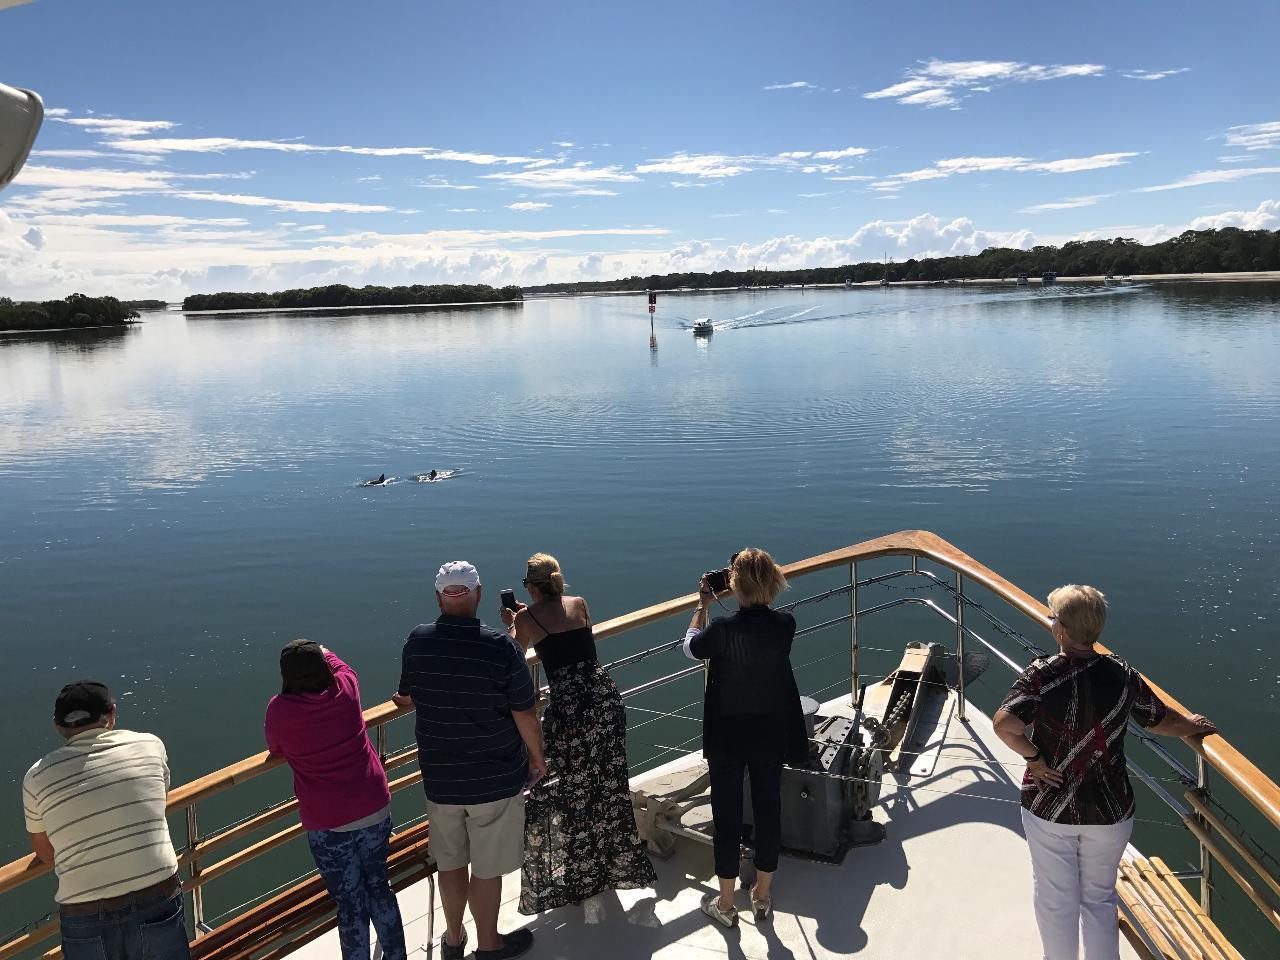 Brisbane to Gold Coast 300 Islands sheltered water cruise-Bretts Wharf Plaza Hamilton departure